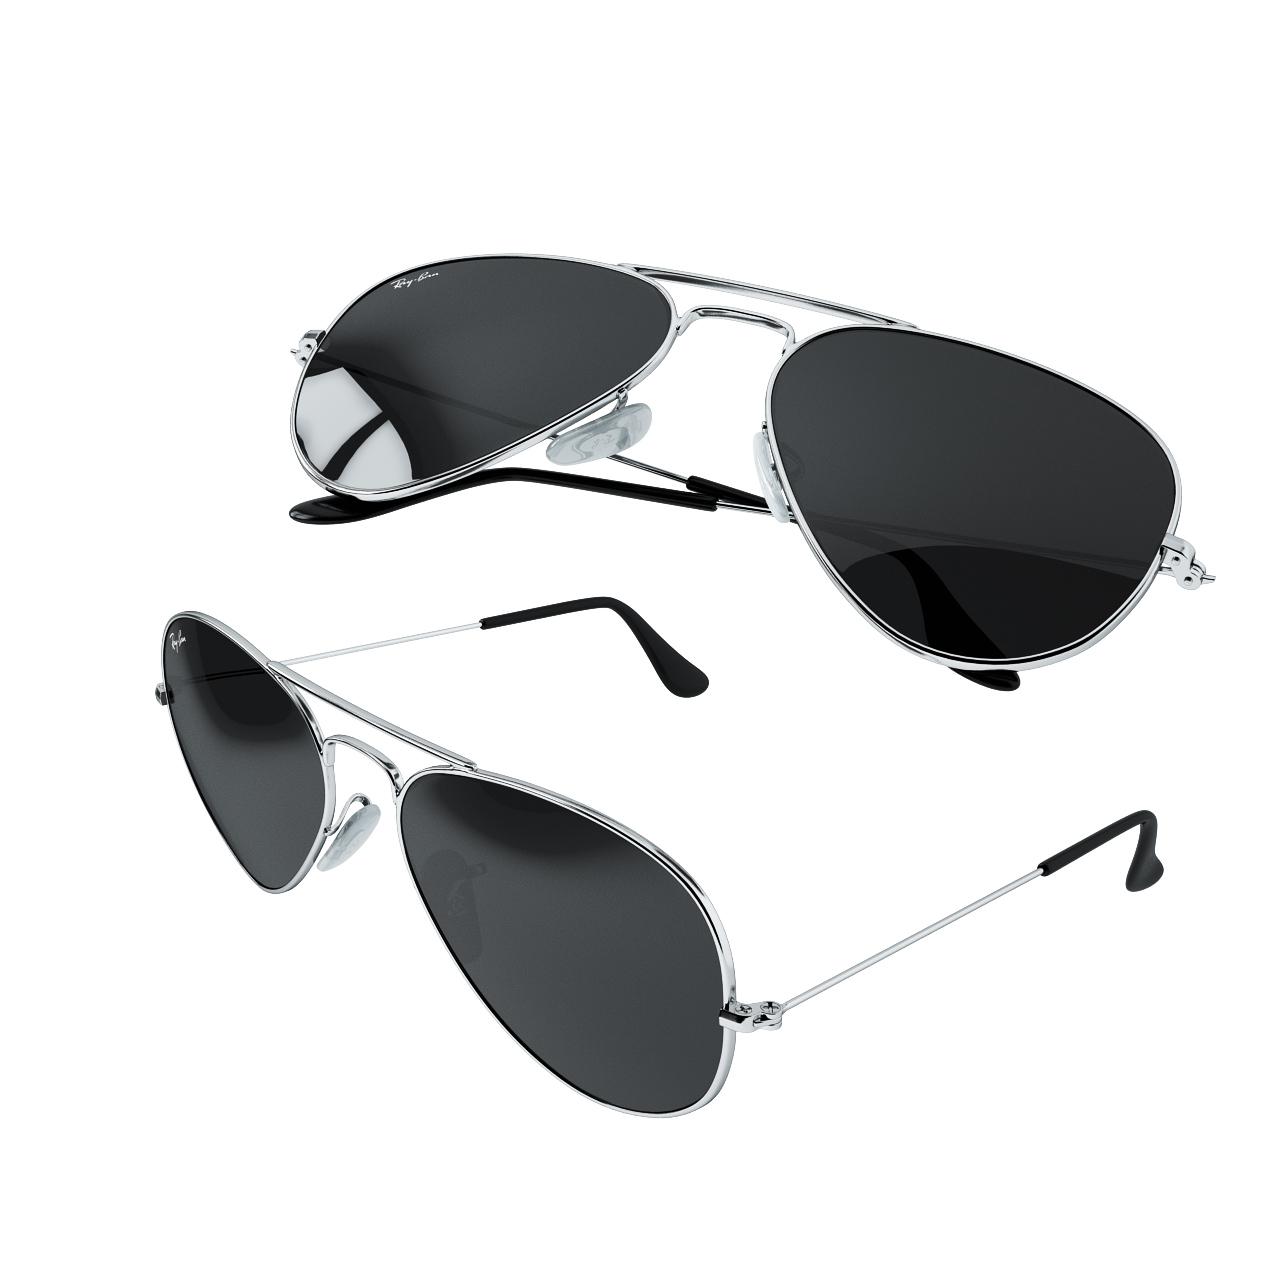 Aviator Sunglasses by RayBan